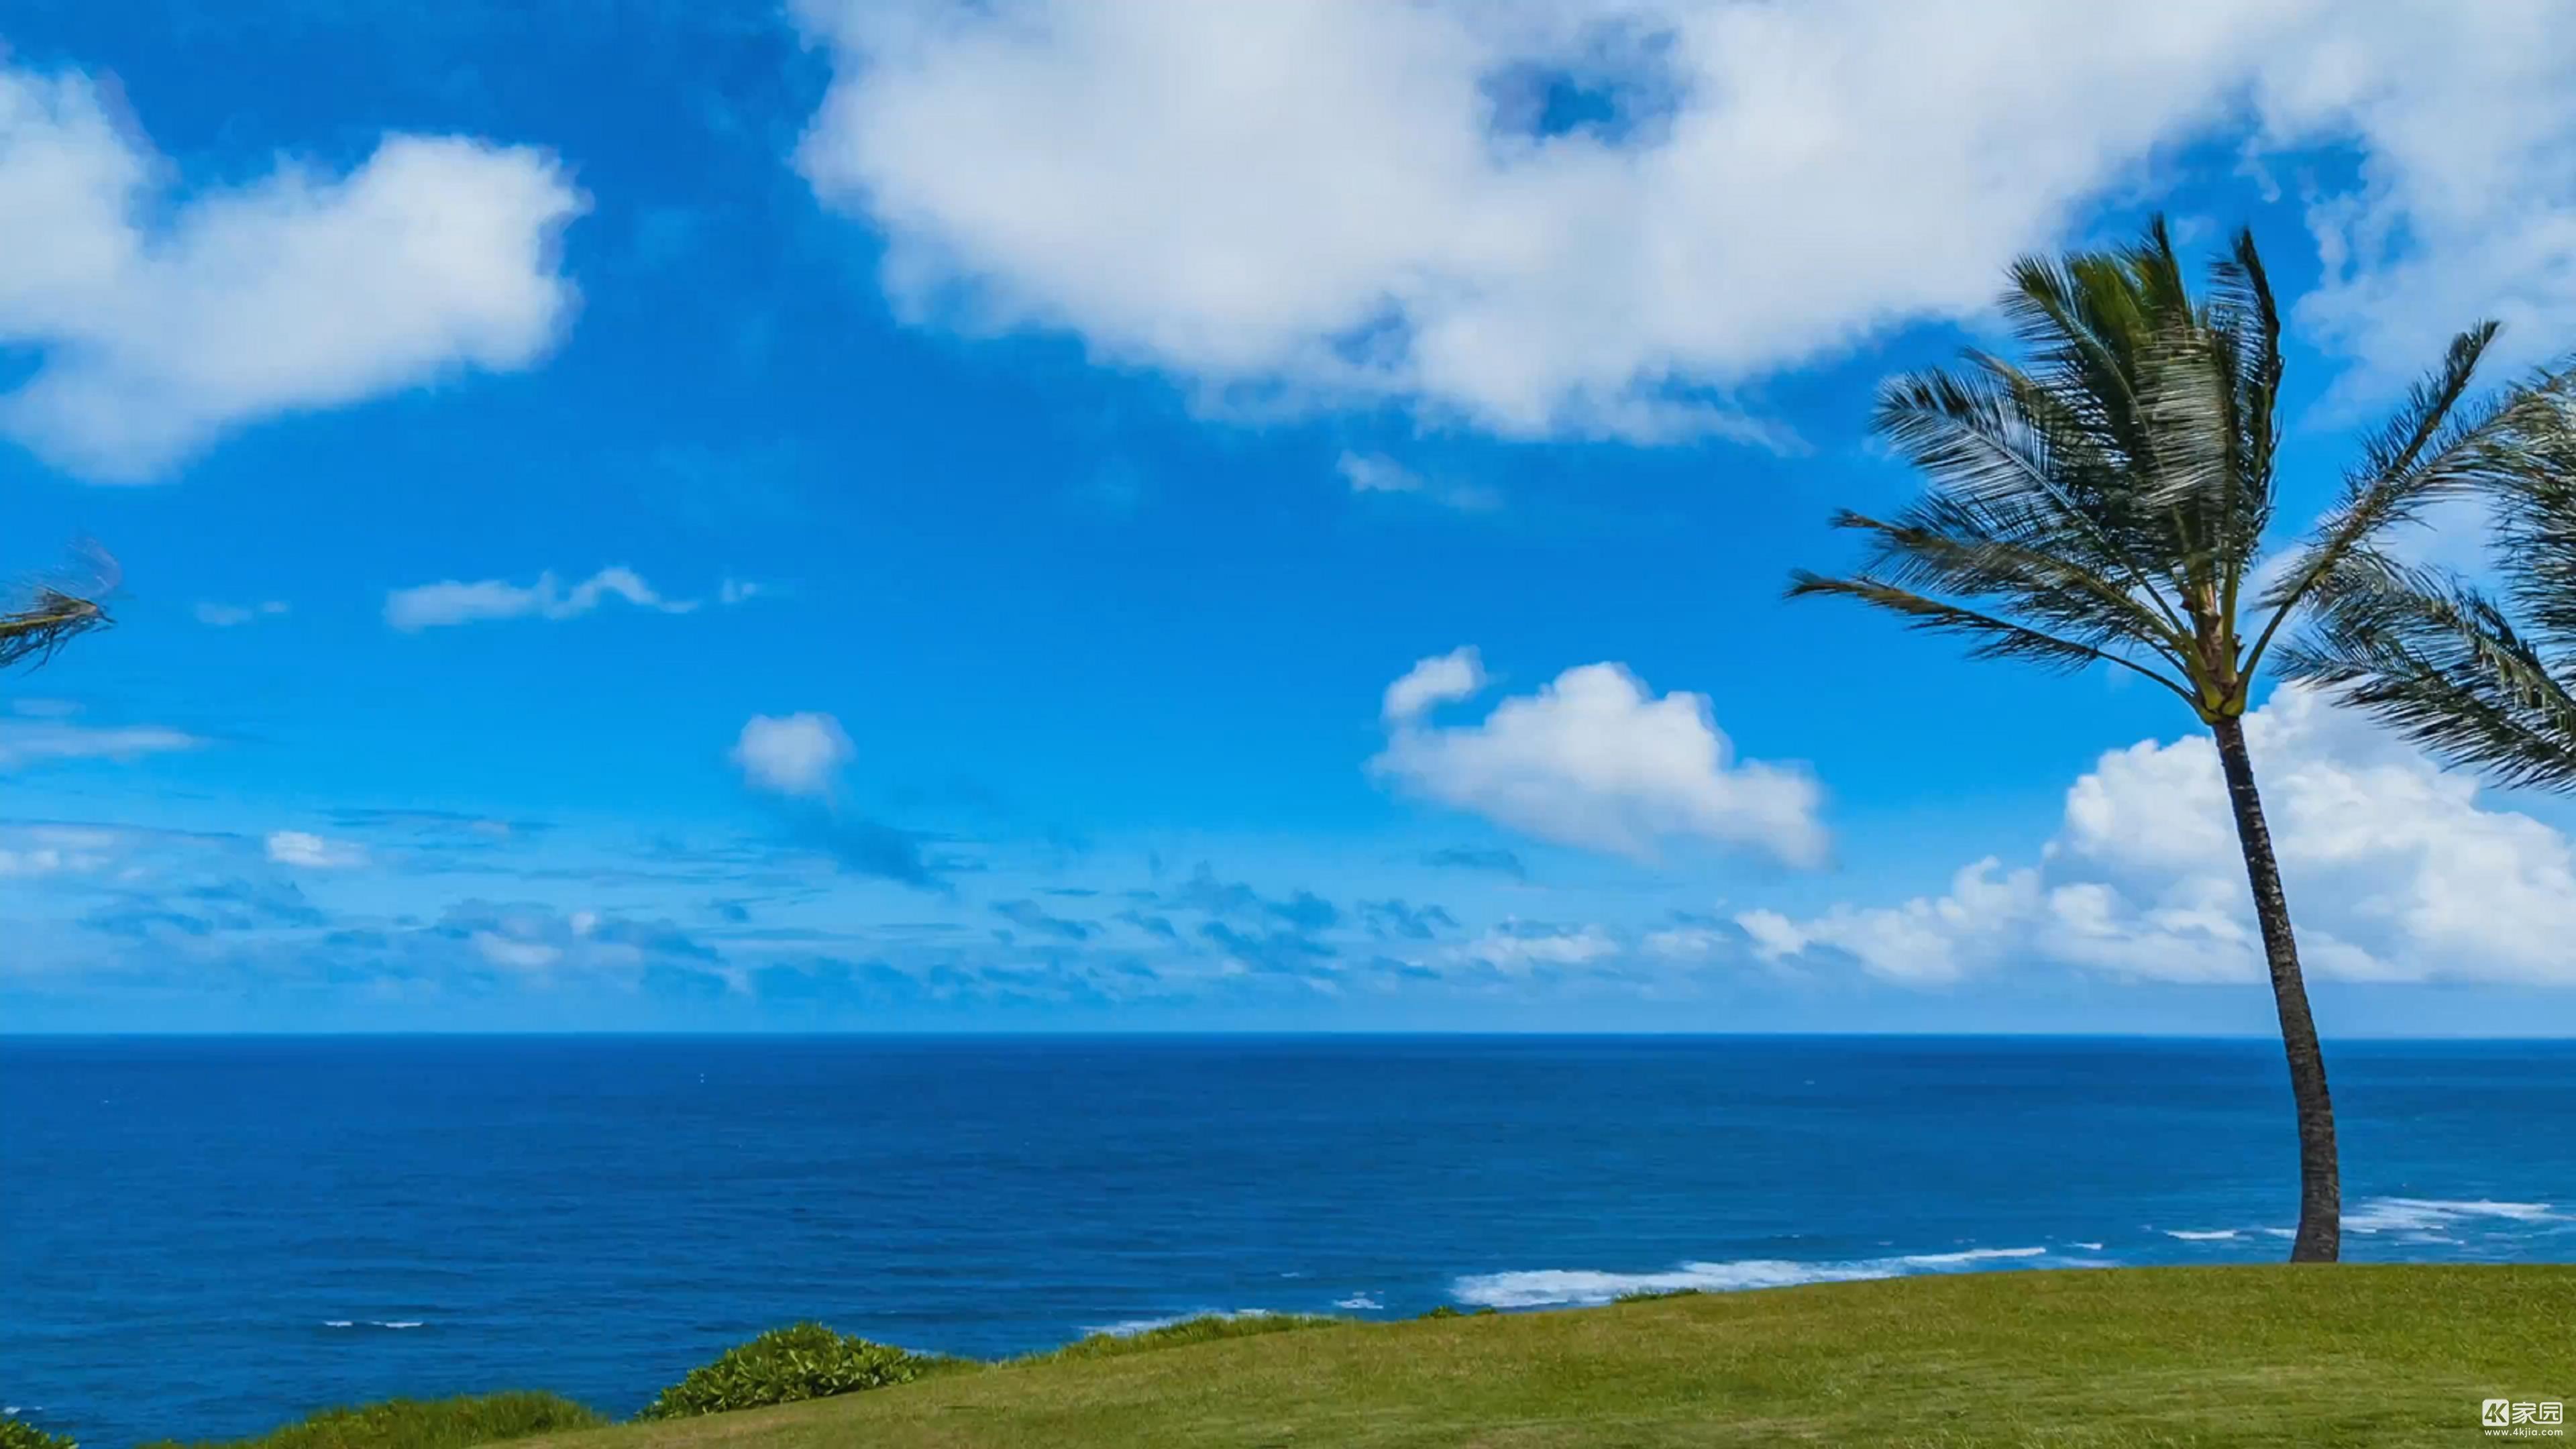 [4k视频] 4k风景-纳米比亚风光 [2160p/mp4/1.31gb]